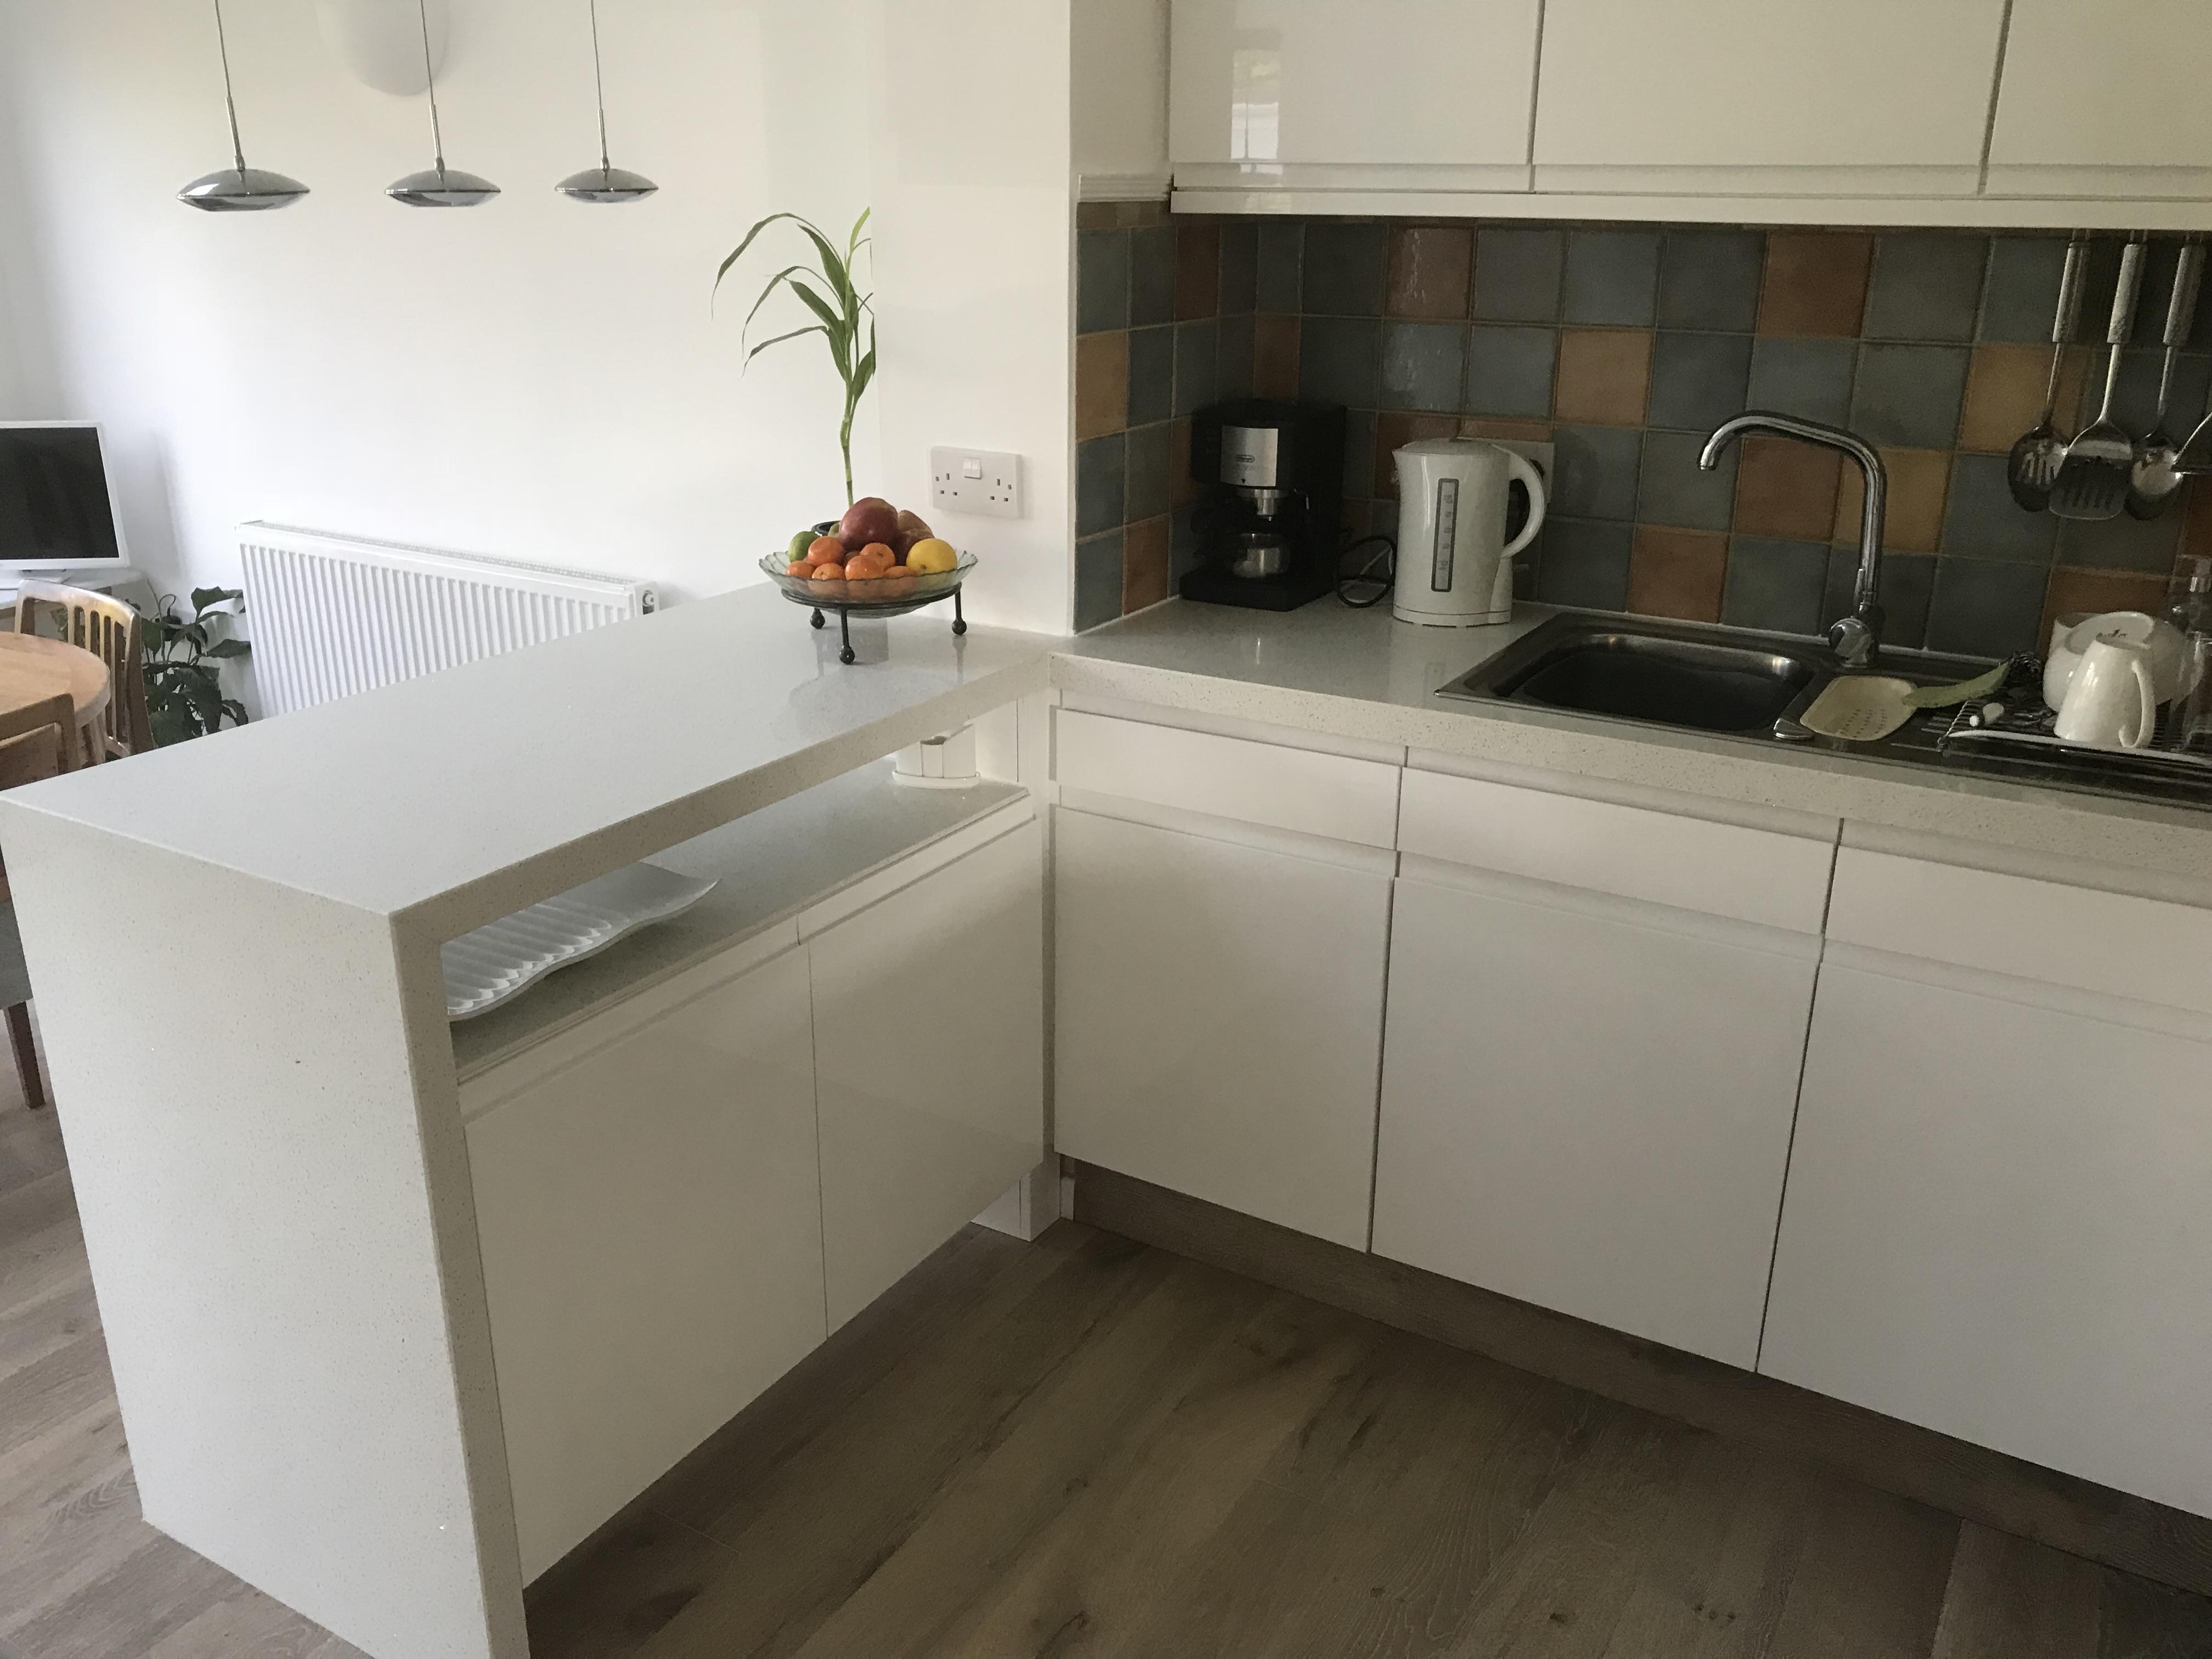 Acrylic replacement kitchens doors